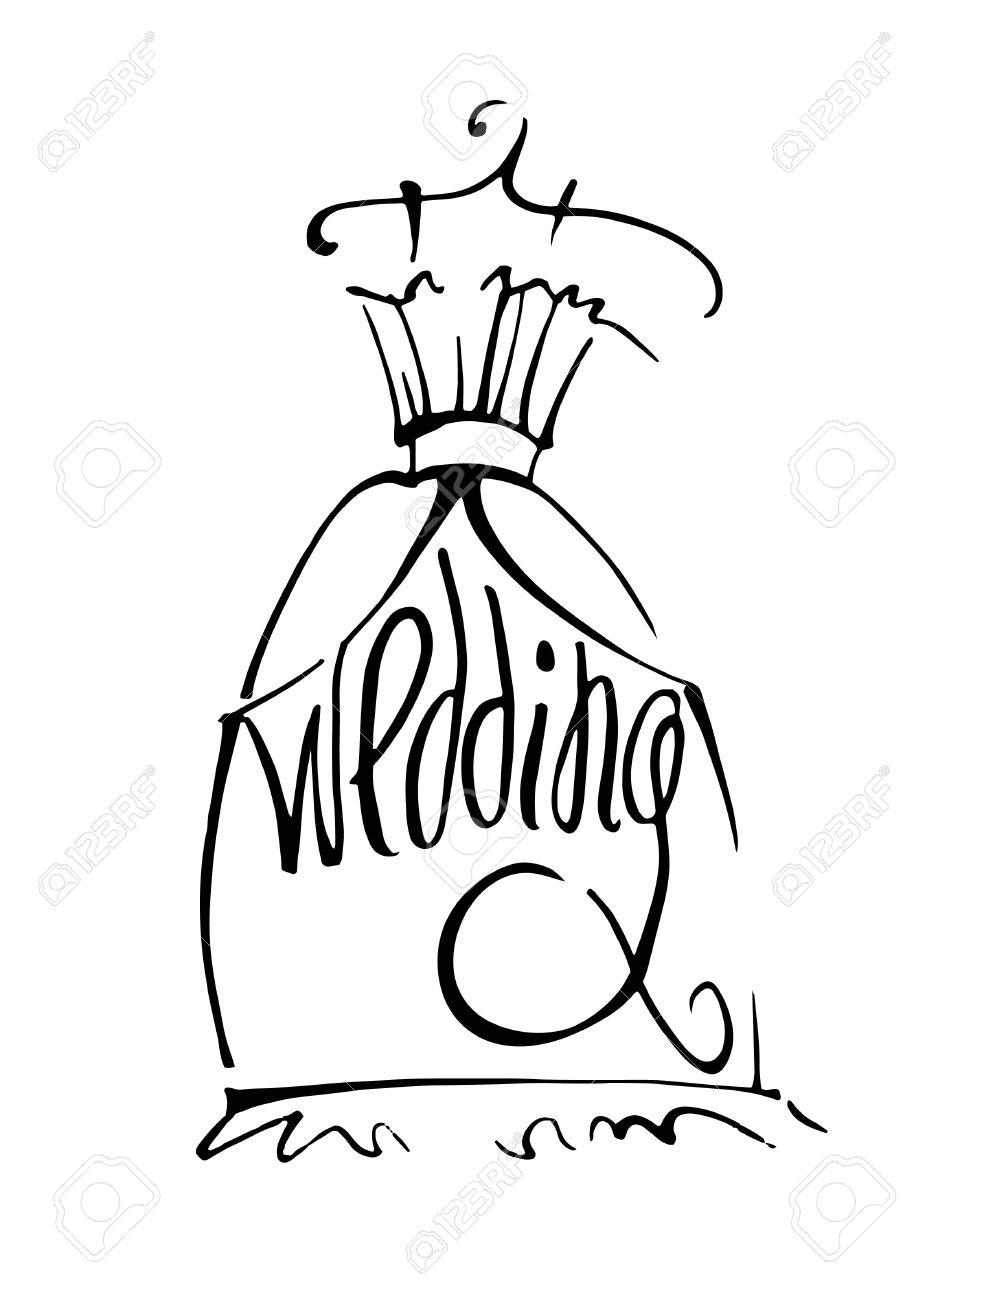 Watch - Dress wedding on hanger drawing photo video